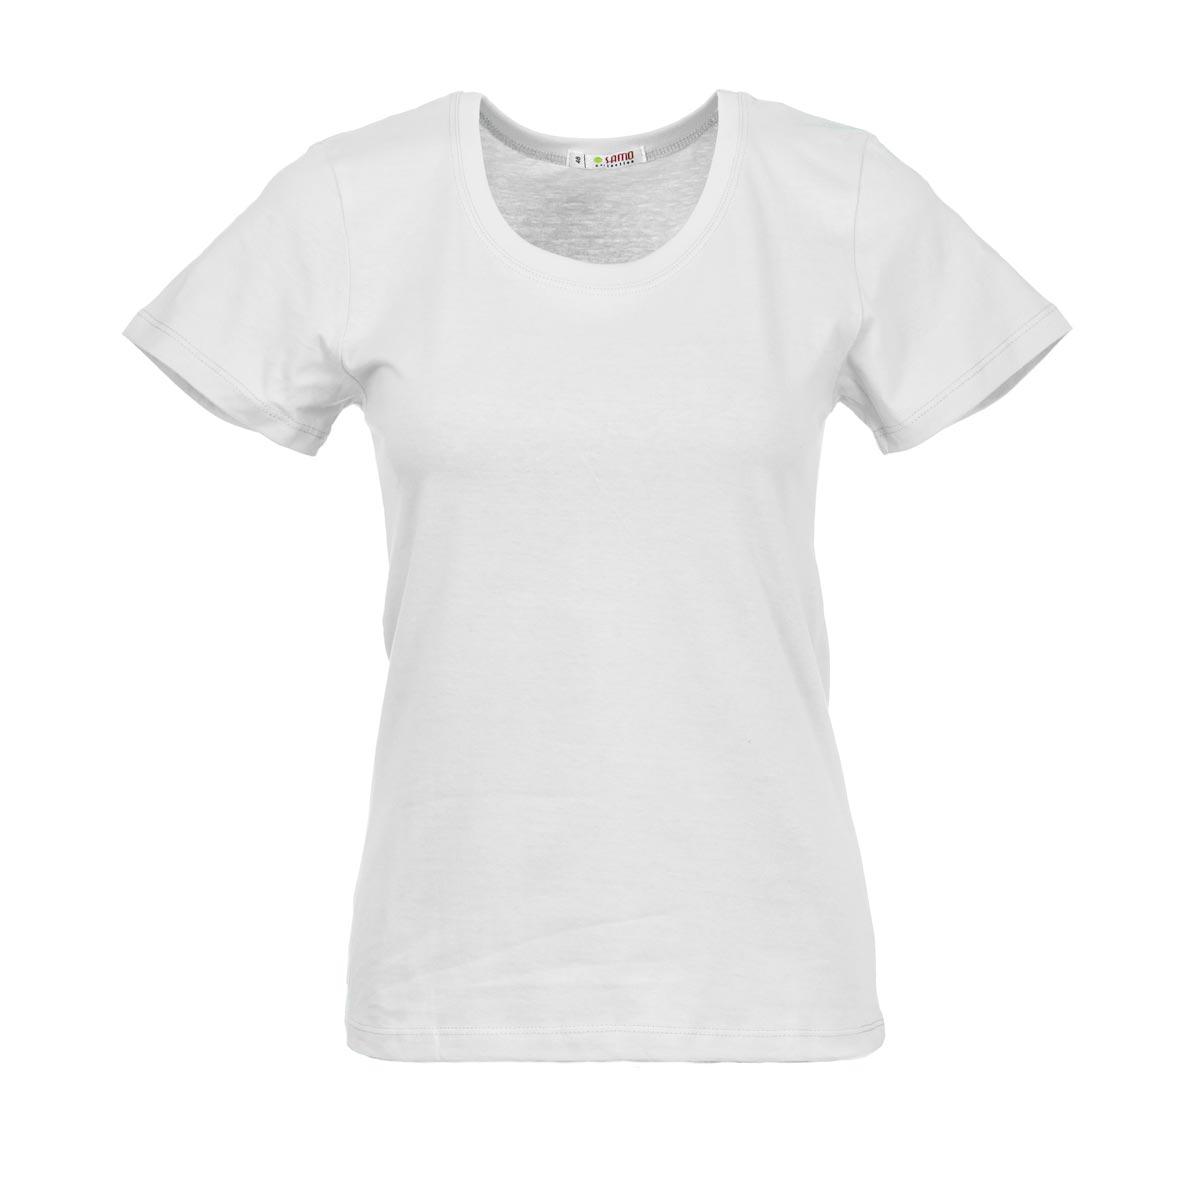 Жен. футболка арт. 04-0045 Белый р. 46Майки и футболки<br>Фактический ОГ:79 см<br>Фактический ОТ:77 см<br>Фактический ОБ:90 см<br>Длина по спинке:57 см<br>Рост:164-170 см<br><br>Тип: Жен. футболка<br>Размер: 46<br>Материал: Супрем